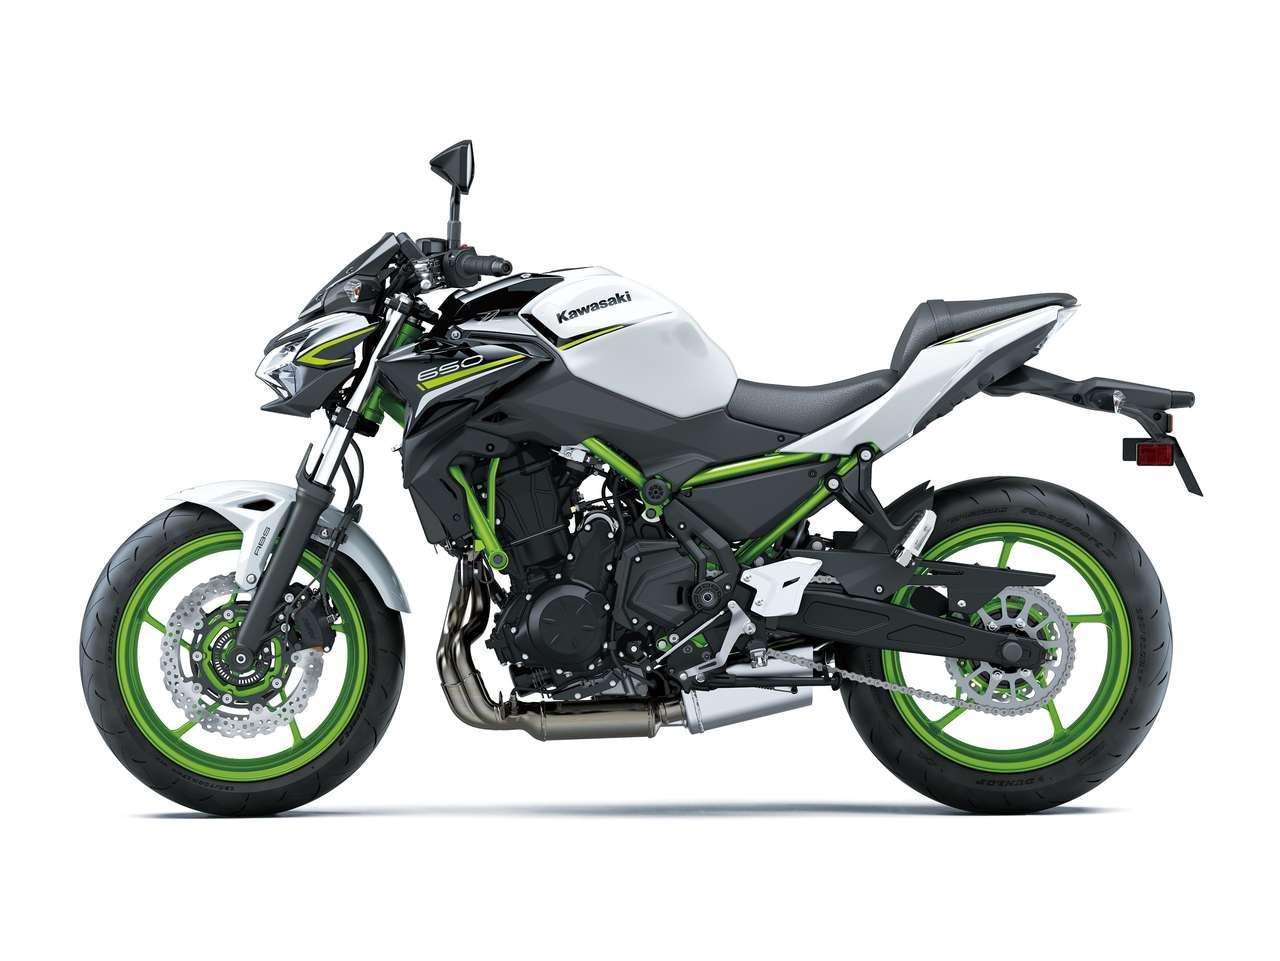 Kawasaki Z650 2021: Pearl Blizzard White/ Metallic Spark Black